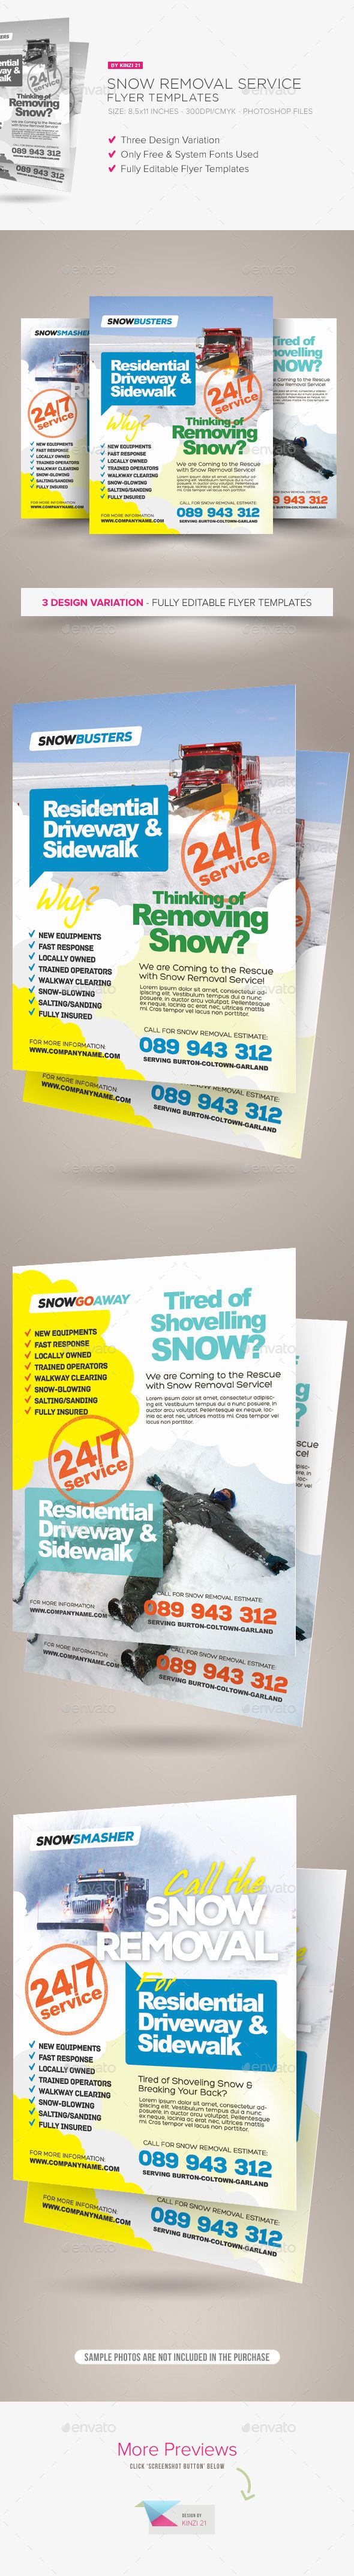 Snow Removal Service Flyers Flyer Templates Pinterest Flyer